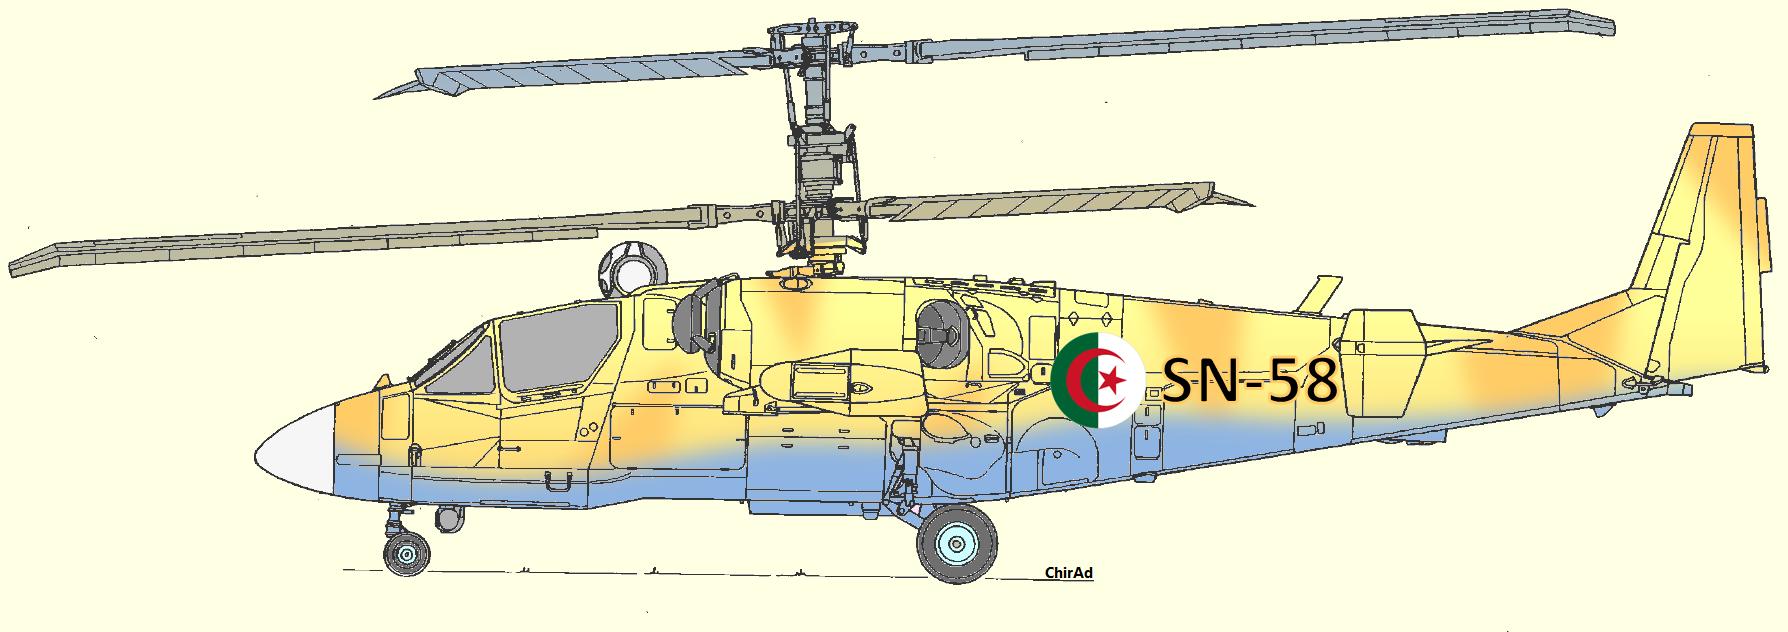 مروحيات Ка-52  الجزائر : الجديد - صفحة 7 26844779890_9d59777e0a_o